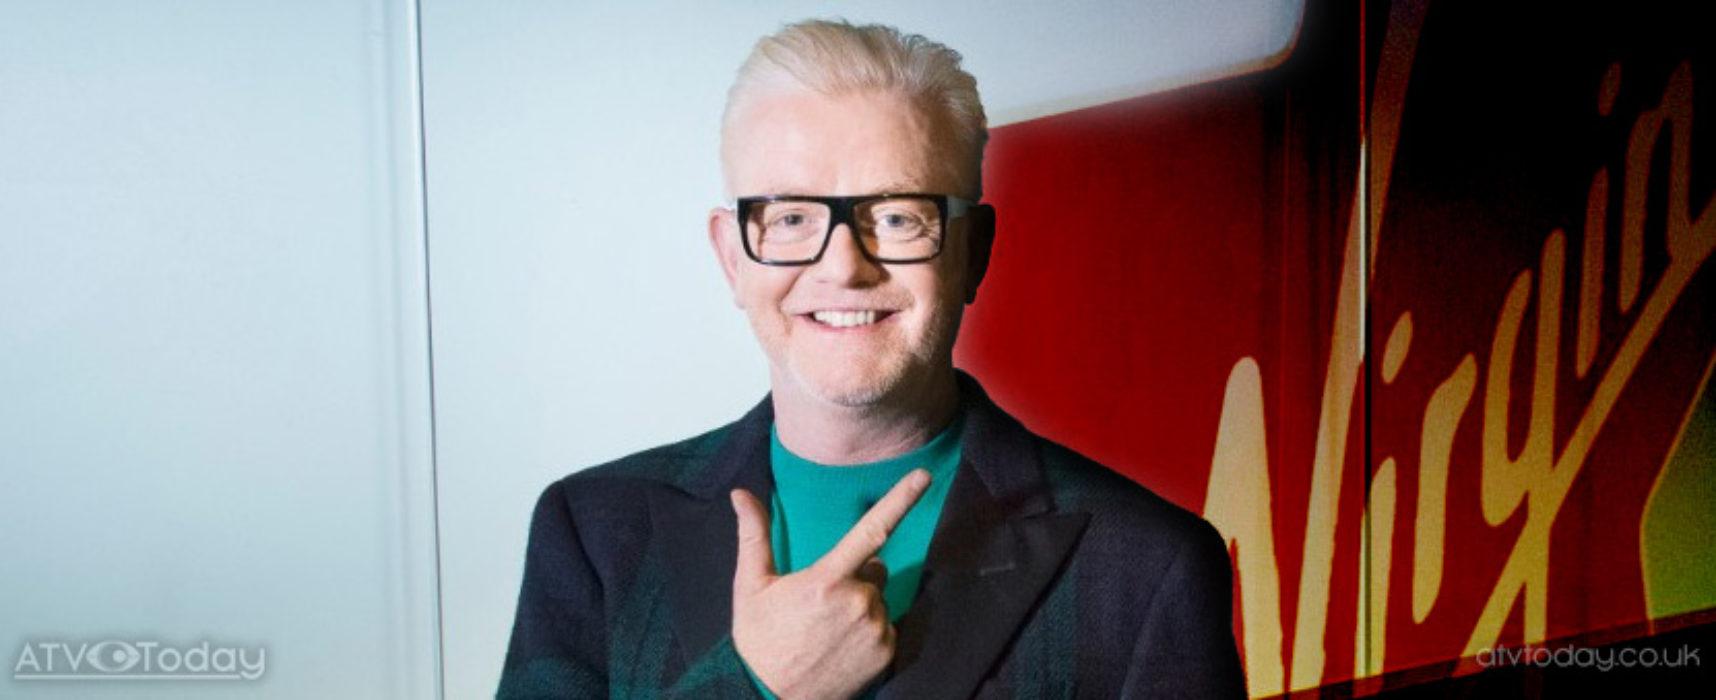 'Ad free' Virgin Radio breakfast show for Chris Evans